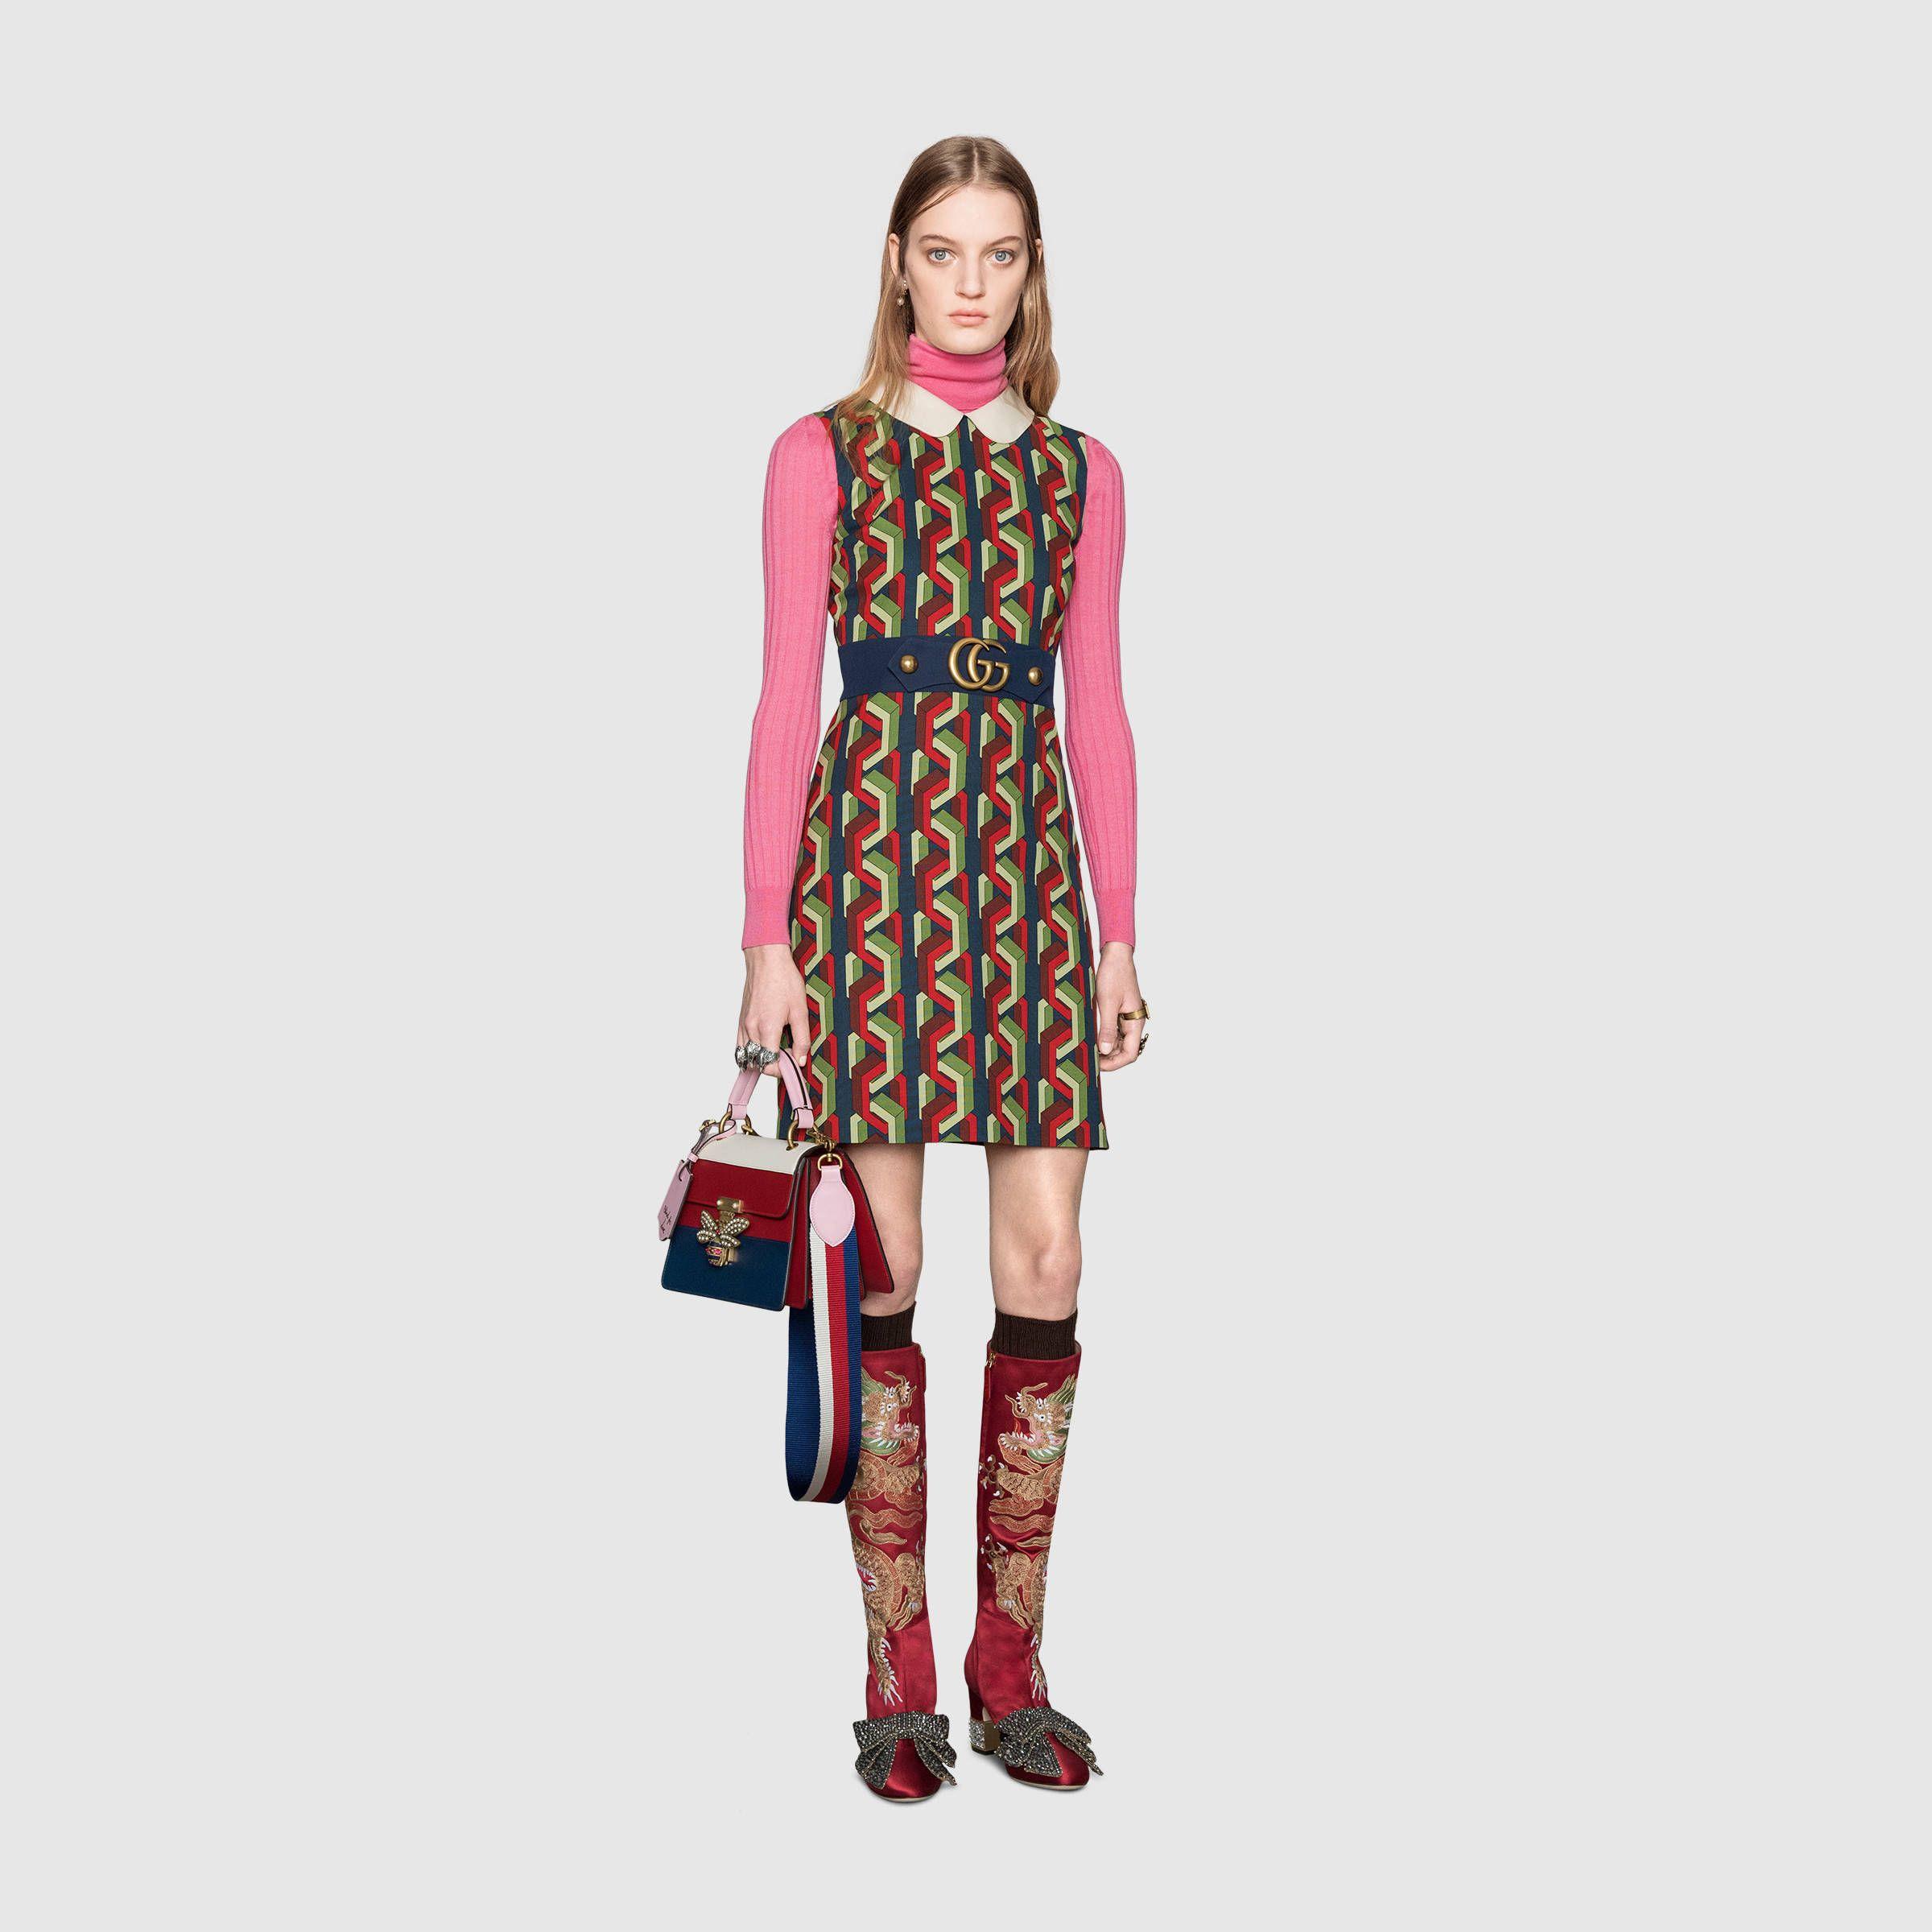 e550b2e629885 Gucci Web chain print dress Detail 2 | Gucci 2017 | Dresses, Long ...